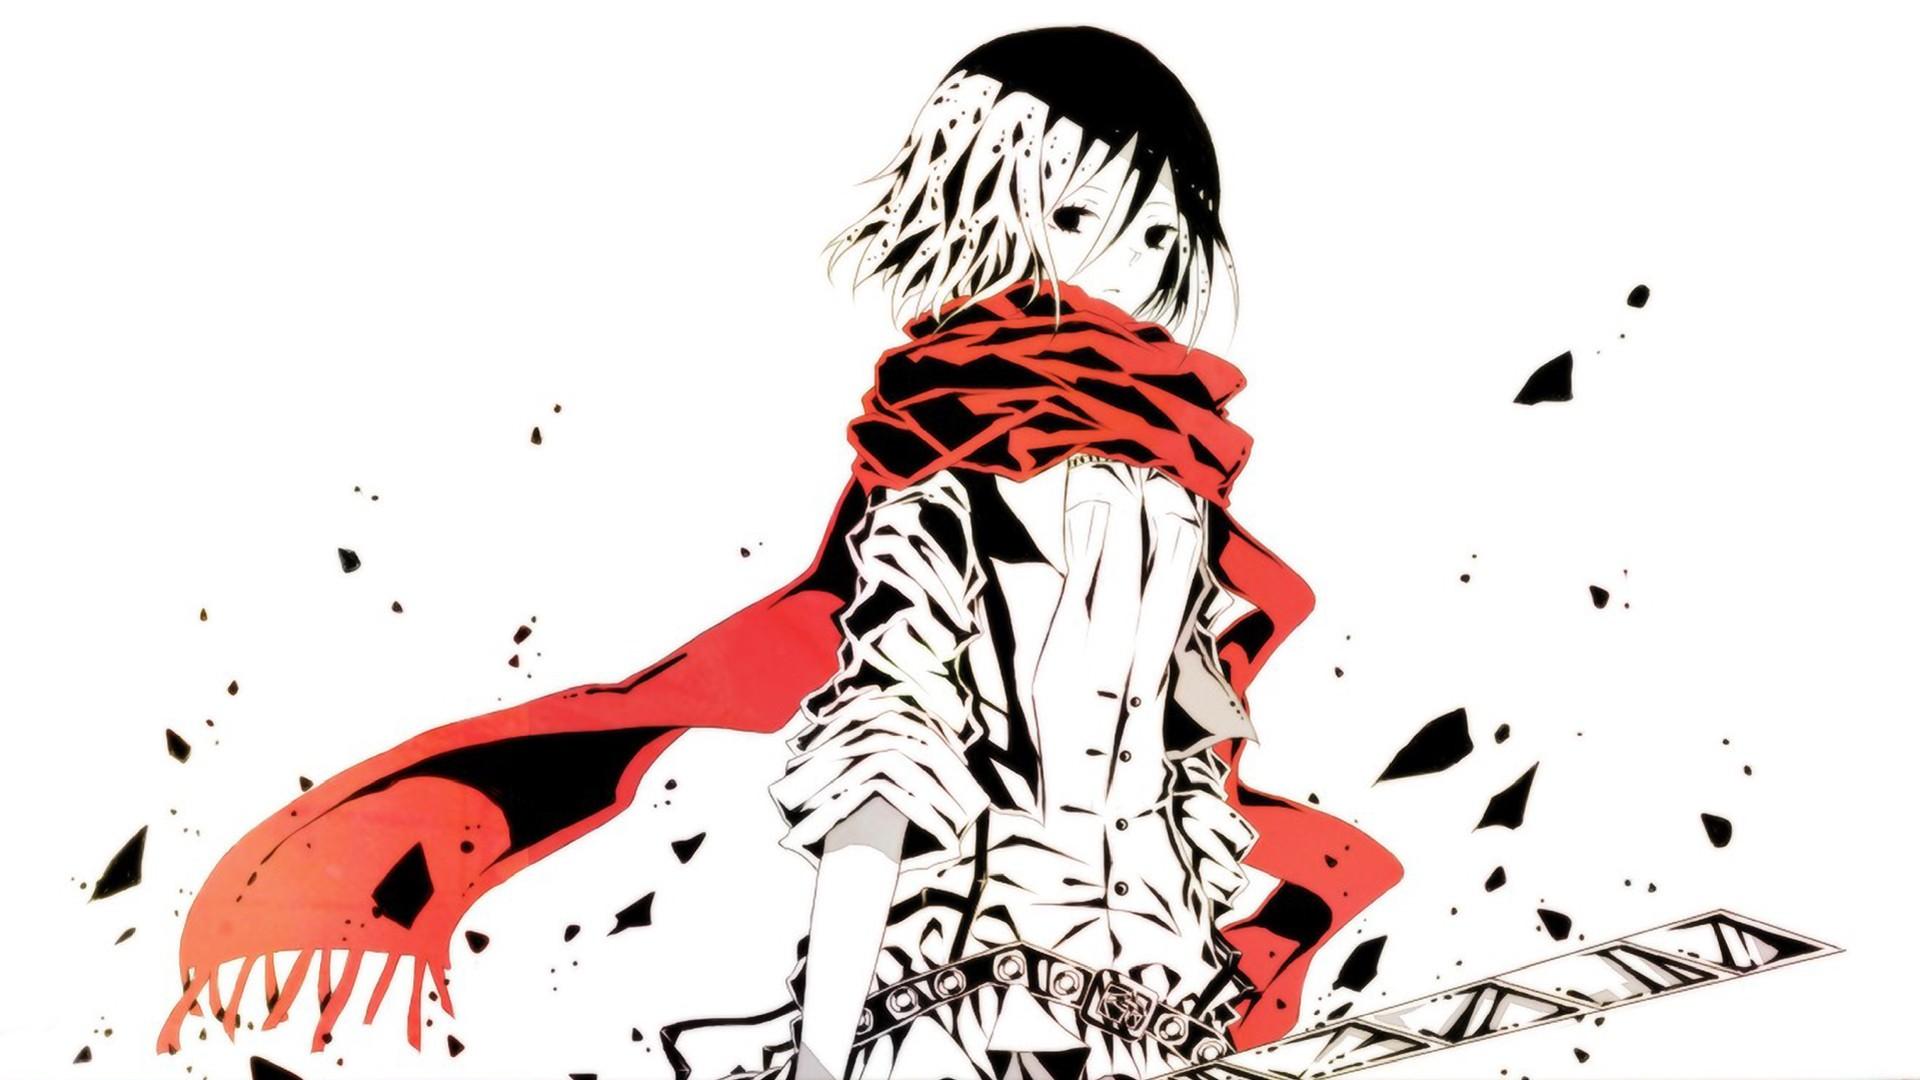 Gambar ilustrasi anime gadis anime gambar kartun shingeki no kyojin mikasa ackerman sketsa fon